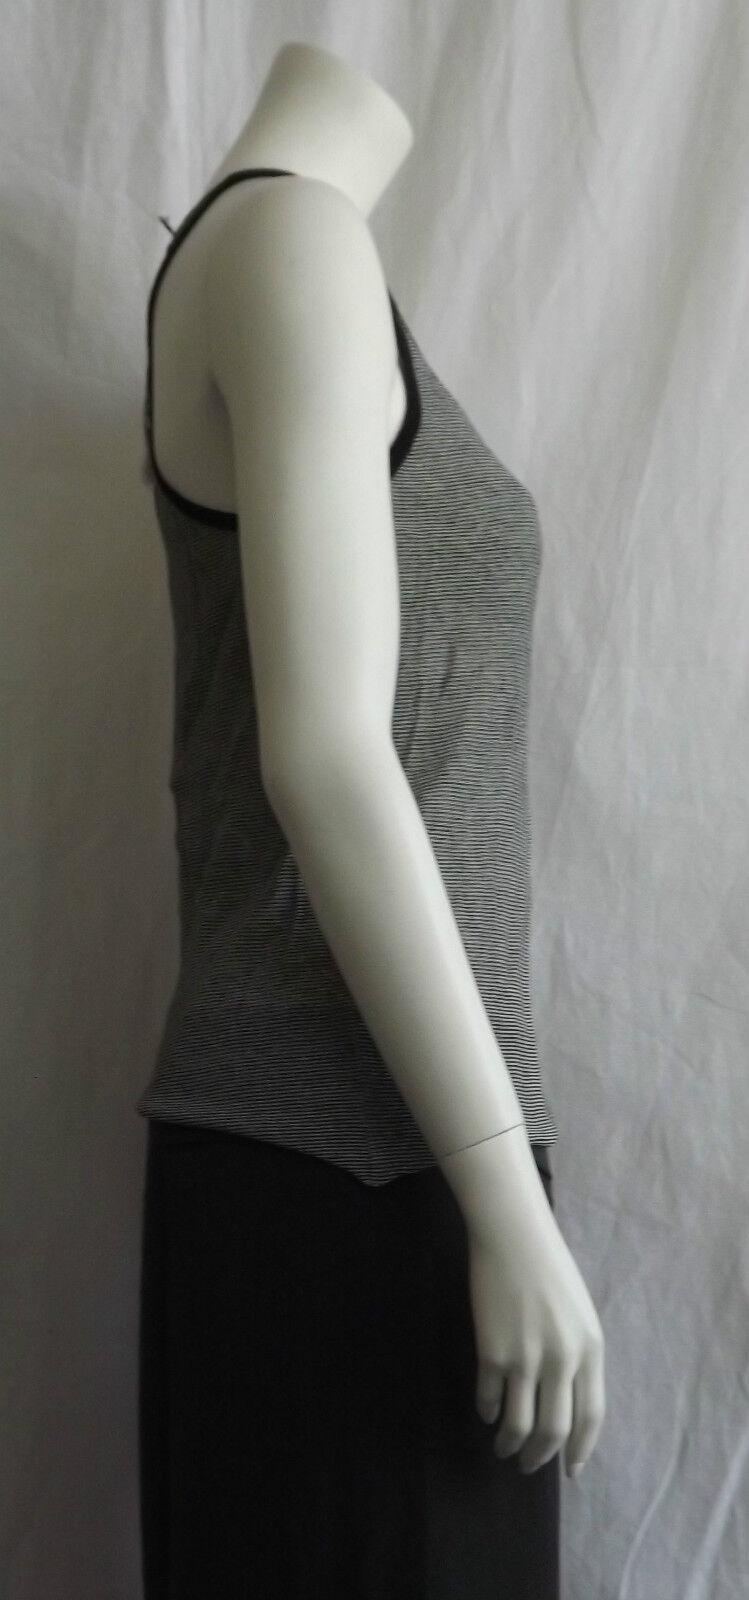 47afd4551935 ... Le donne indossano indossano indossano Sarah Pacini Lino Mix Nero e  Bianco Knit Wear Top sp ...